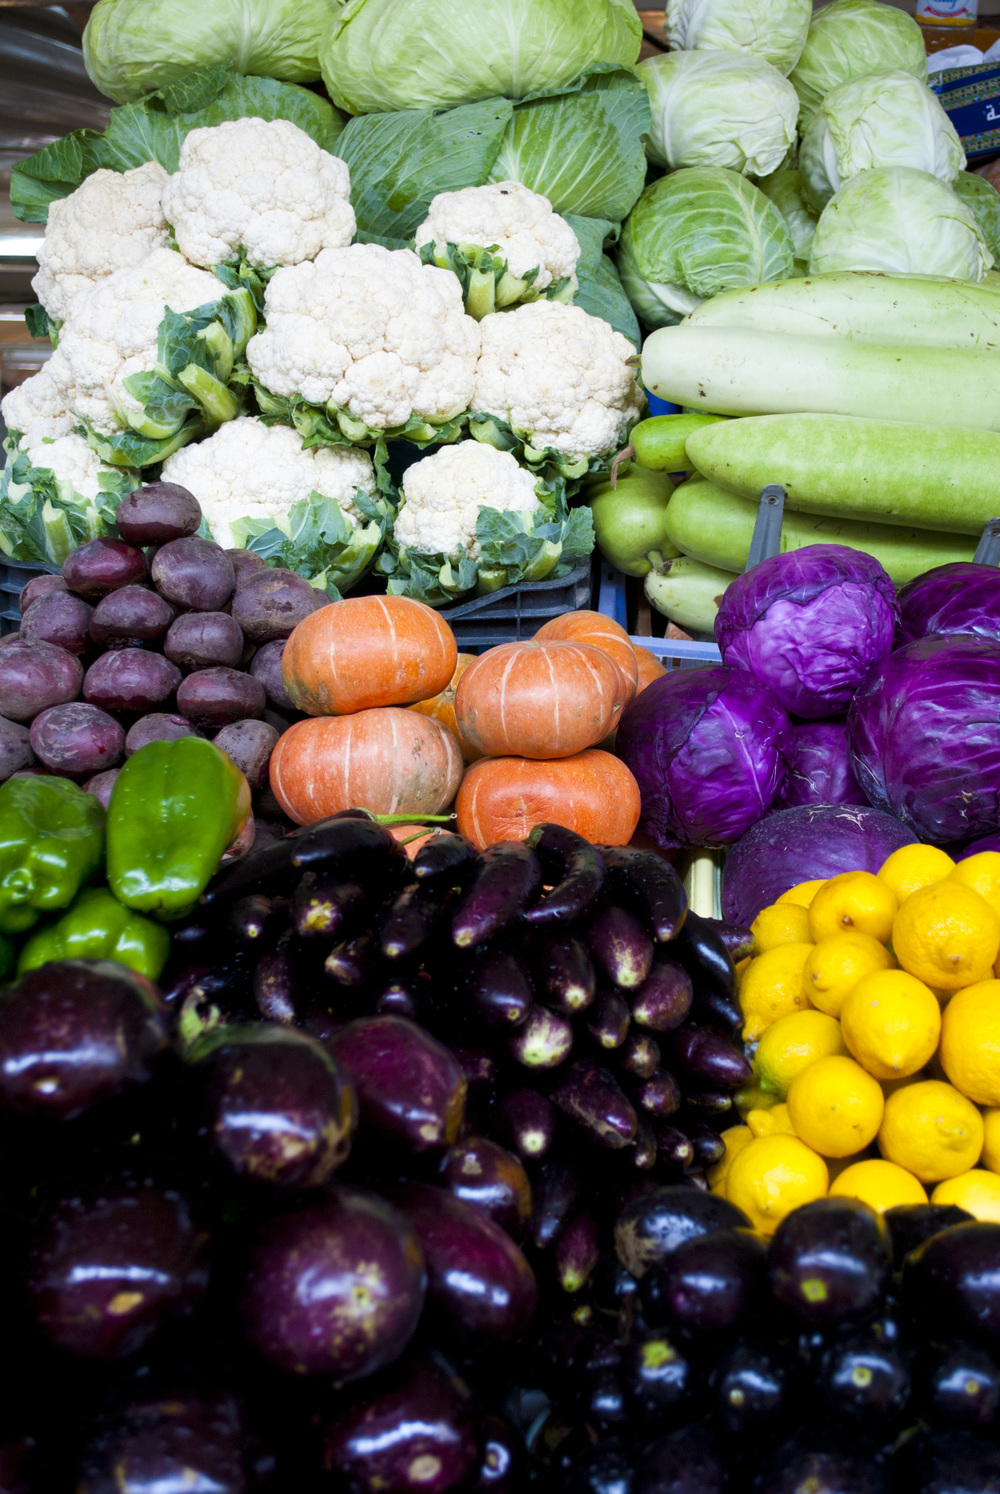 041411Dubai Pumpkins Eggplants and Cauliflowers